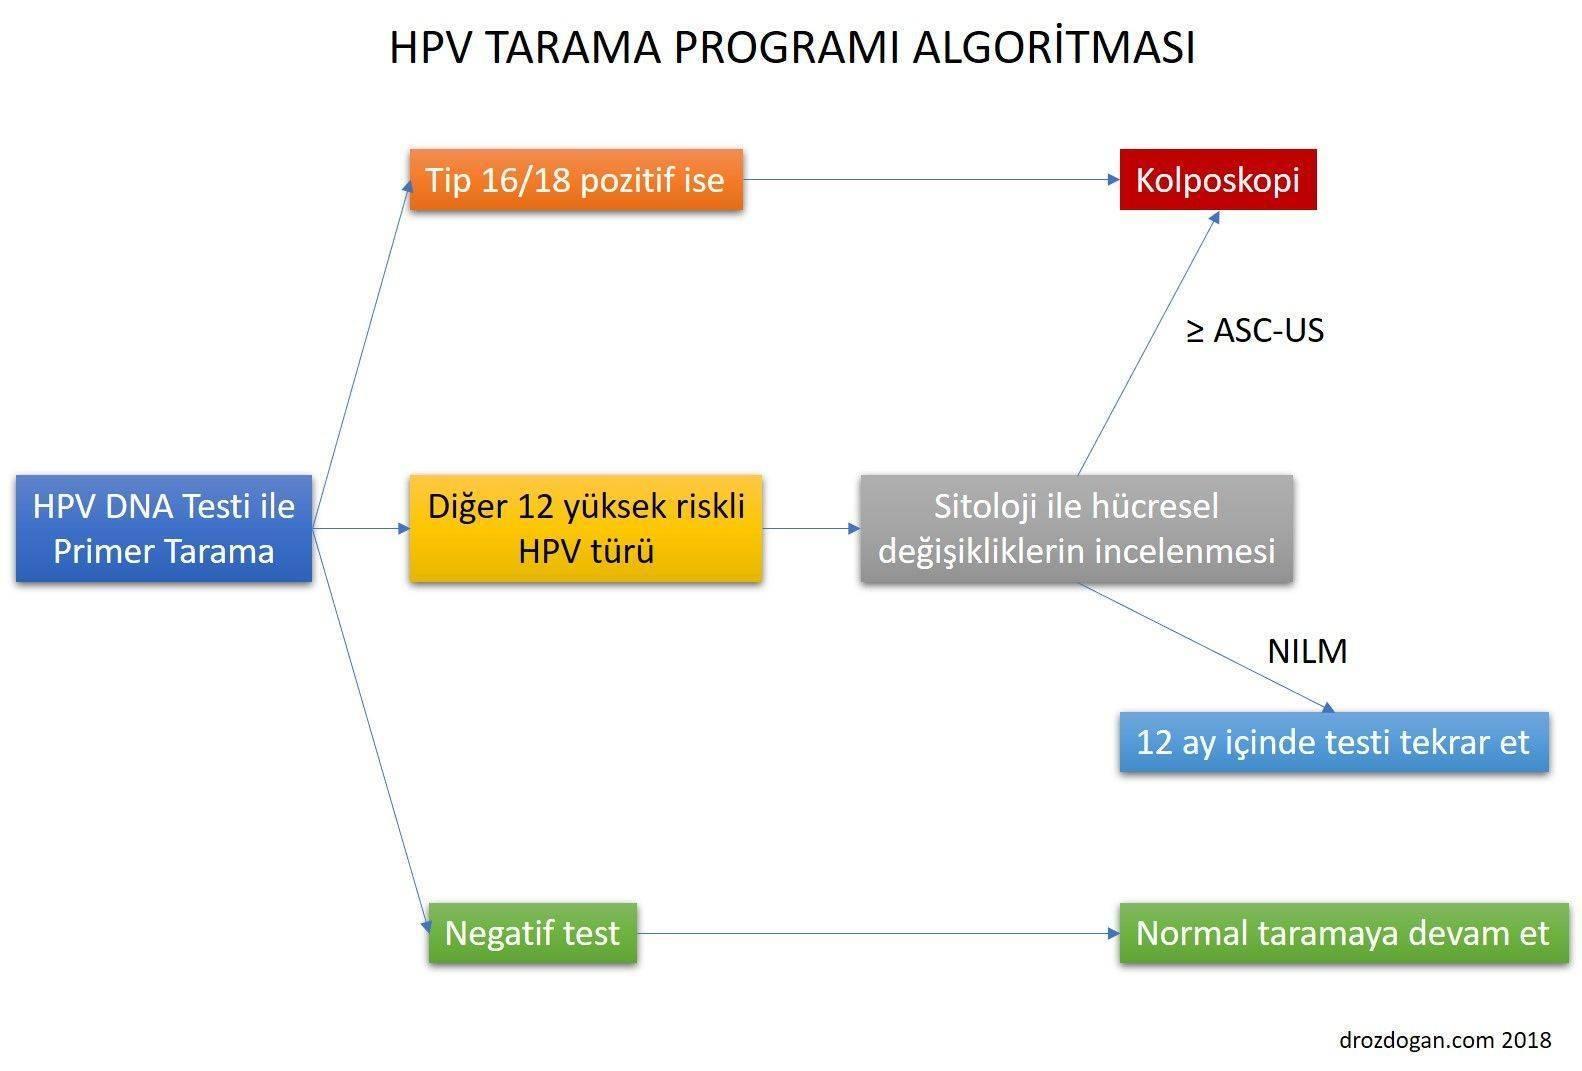 hpv dna jelentése